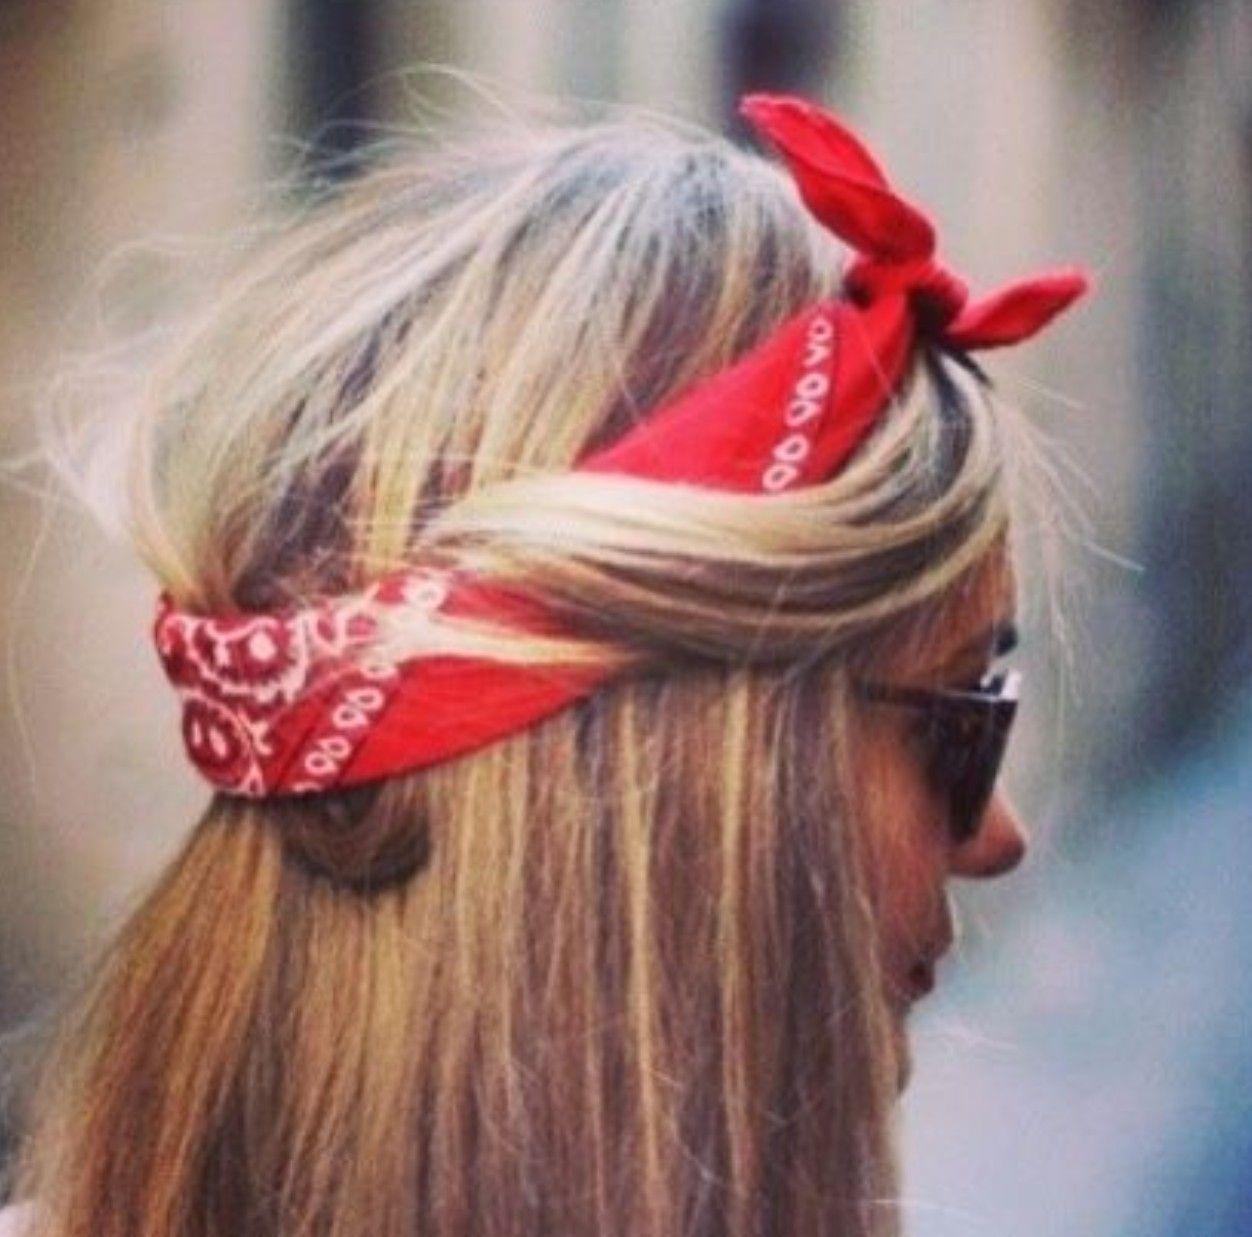 3 Ways To Wear Your Bandana #80s #style #fashion #bandana